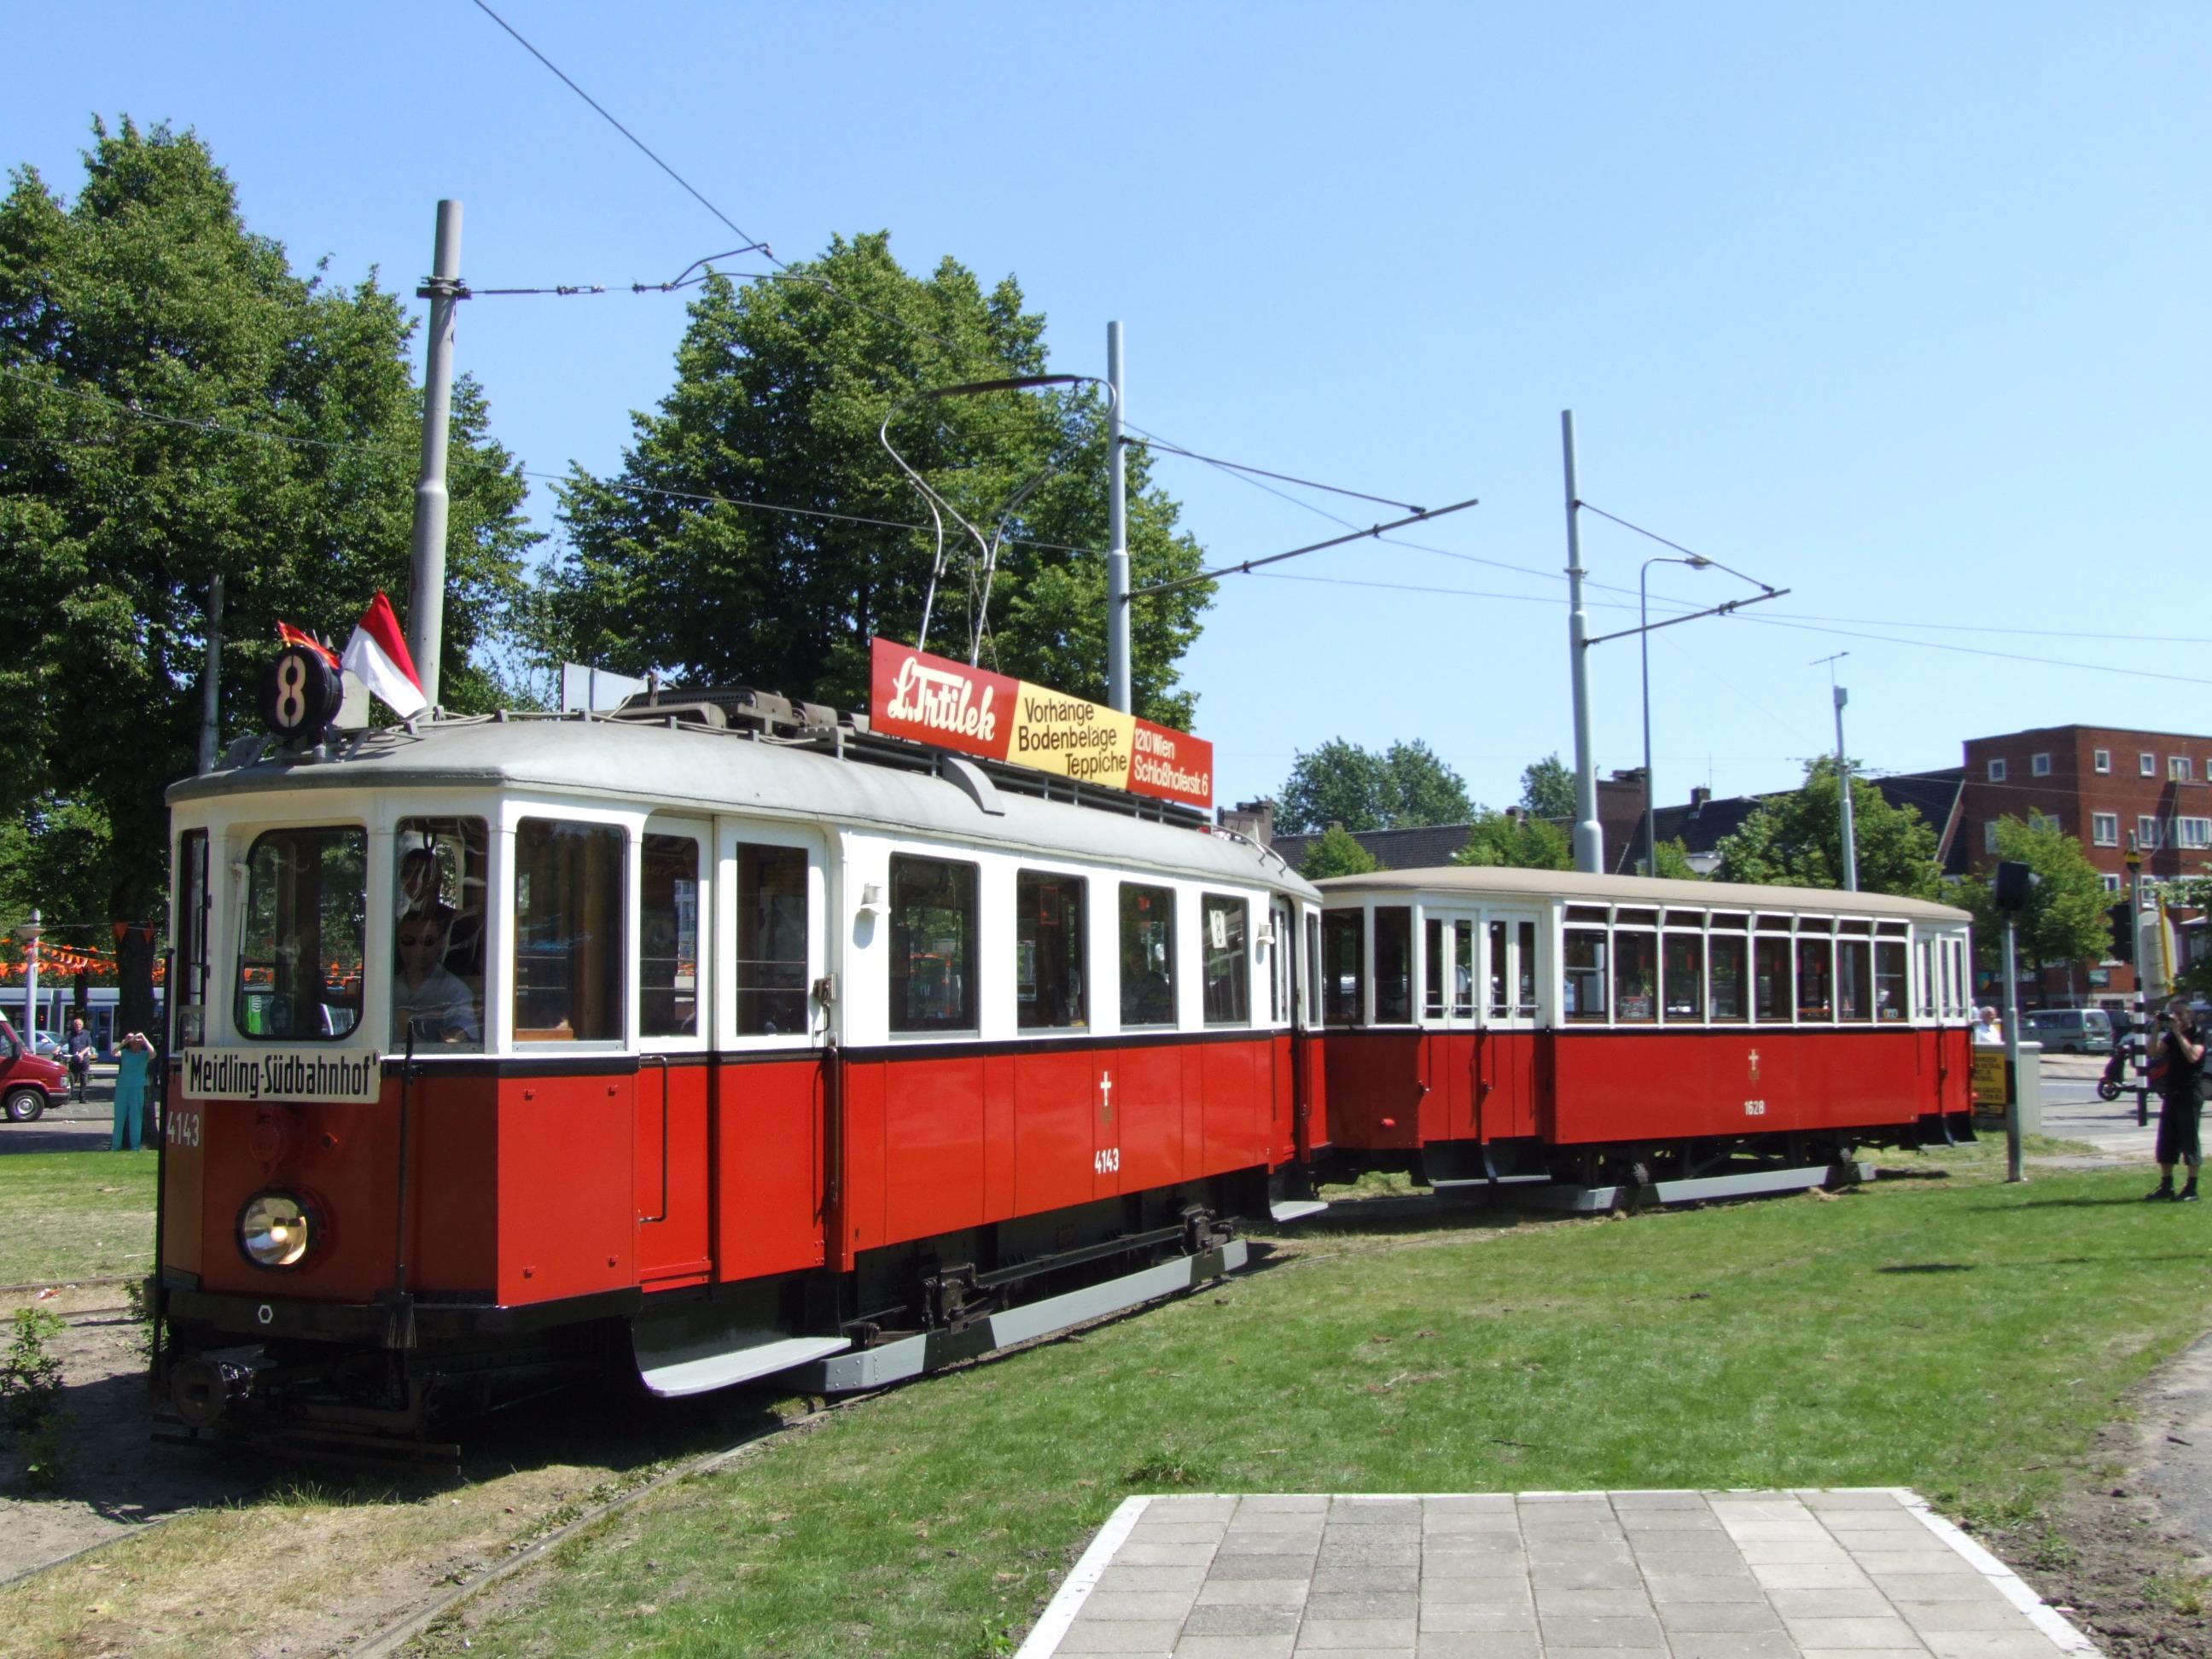 39: Crossing a Gracht: Brüssel (Brussels) Tram 5008.